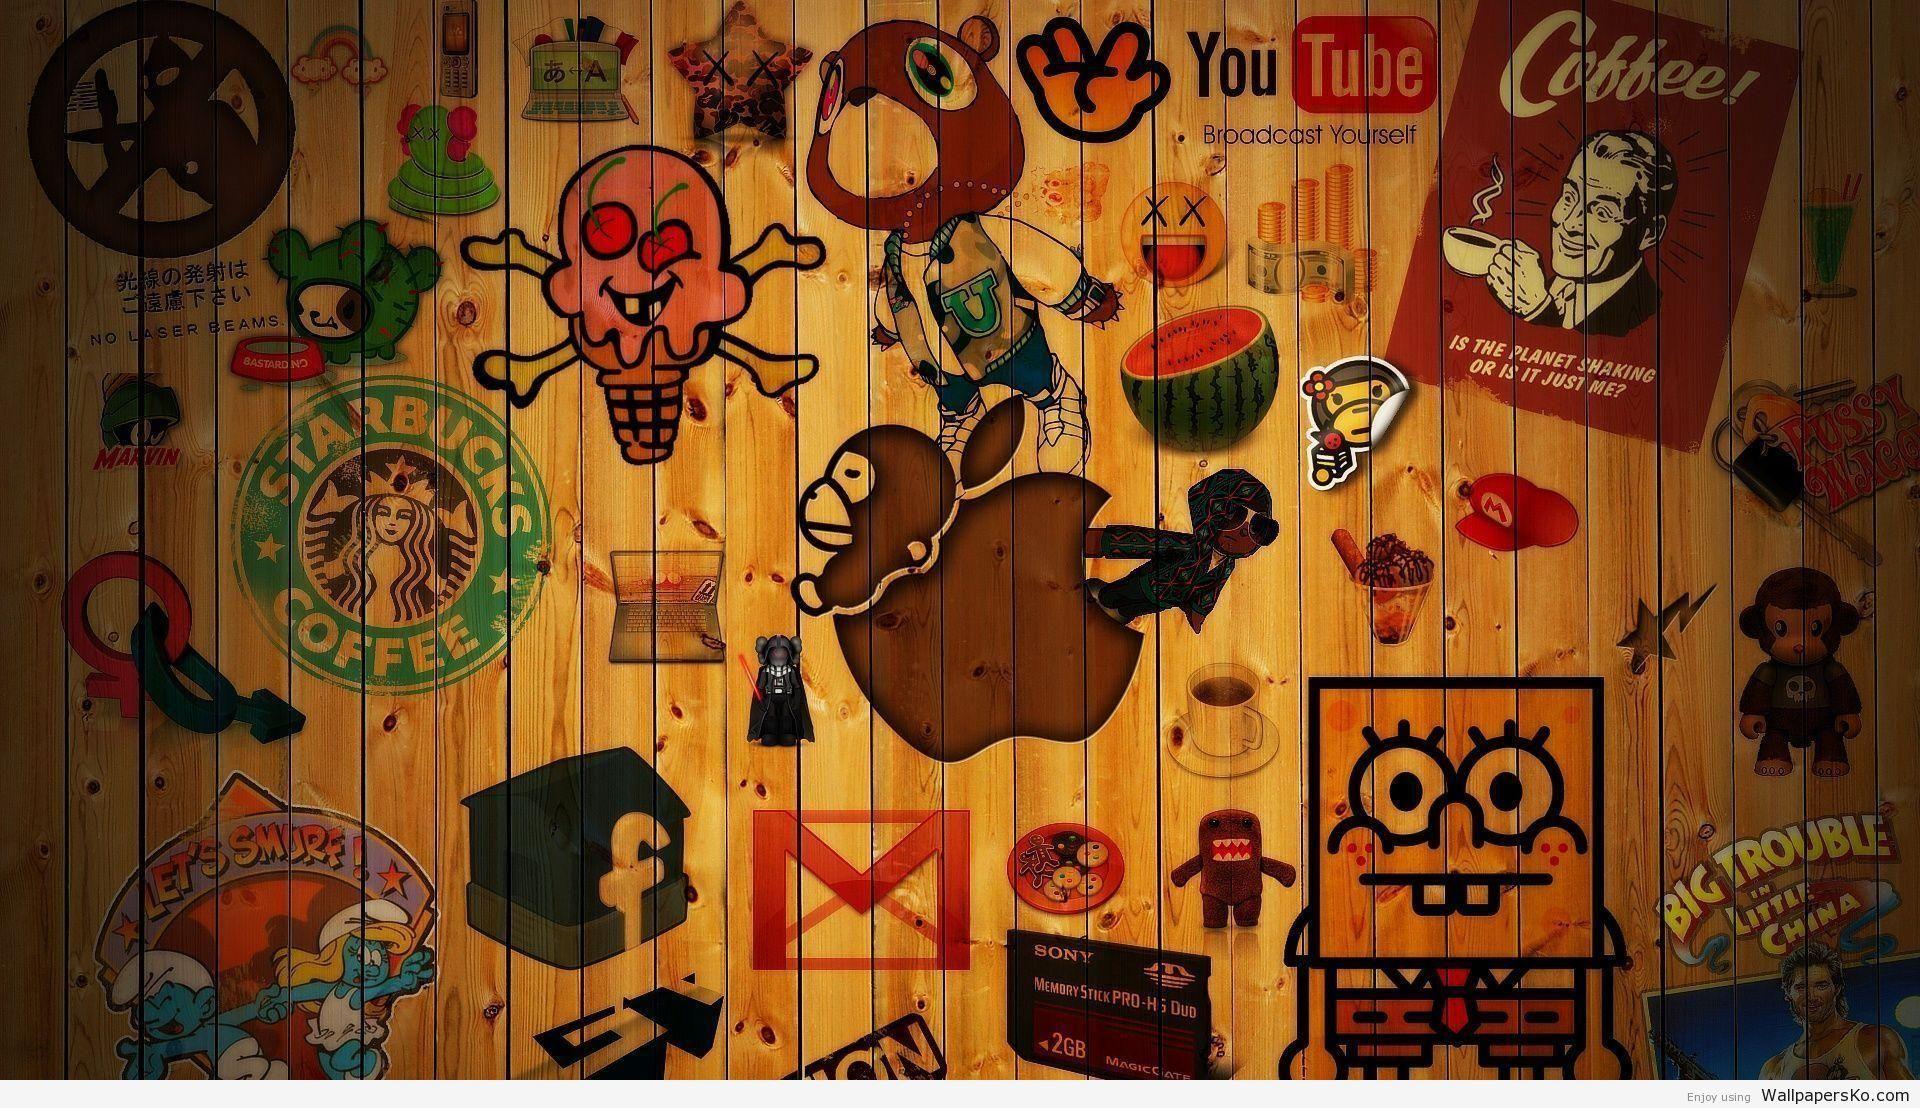 Cool Hd Wallpapers Http Wallpapersko Com Cool Hd Wallpapers Html Hd Wallpapers Download Bape Wallpapers Apple Logo Wallpaper Hd Cool Wallpapers